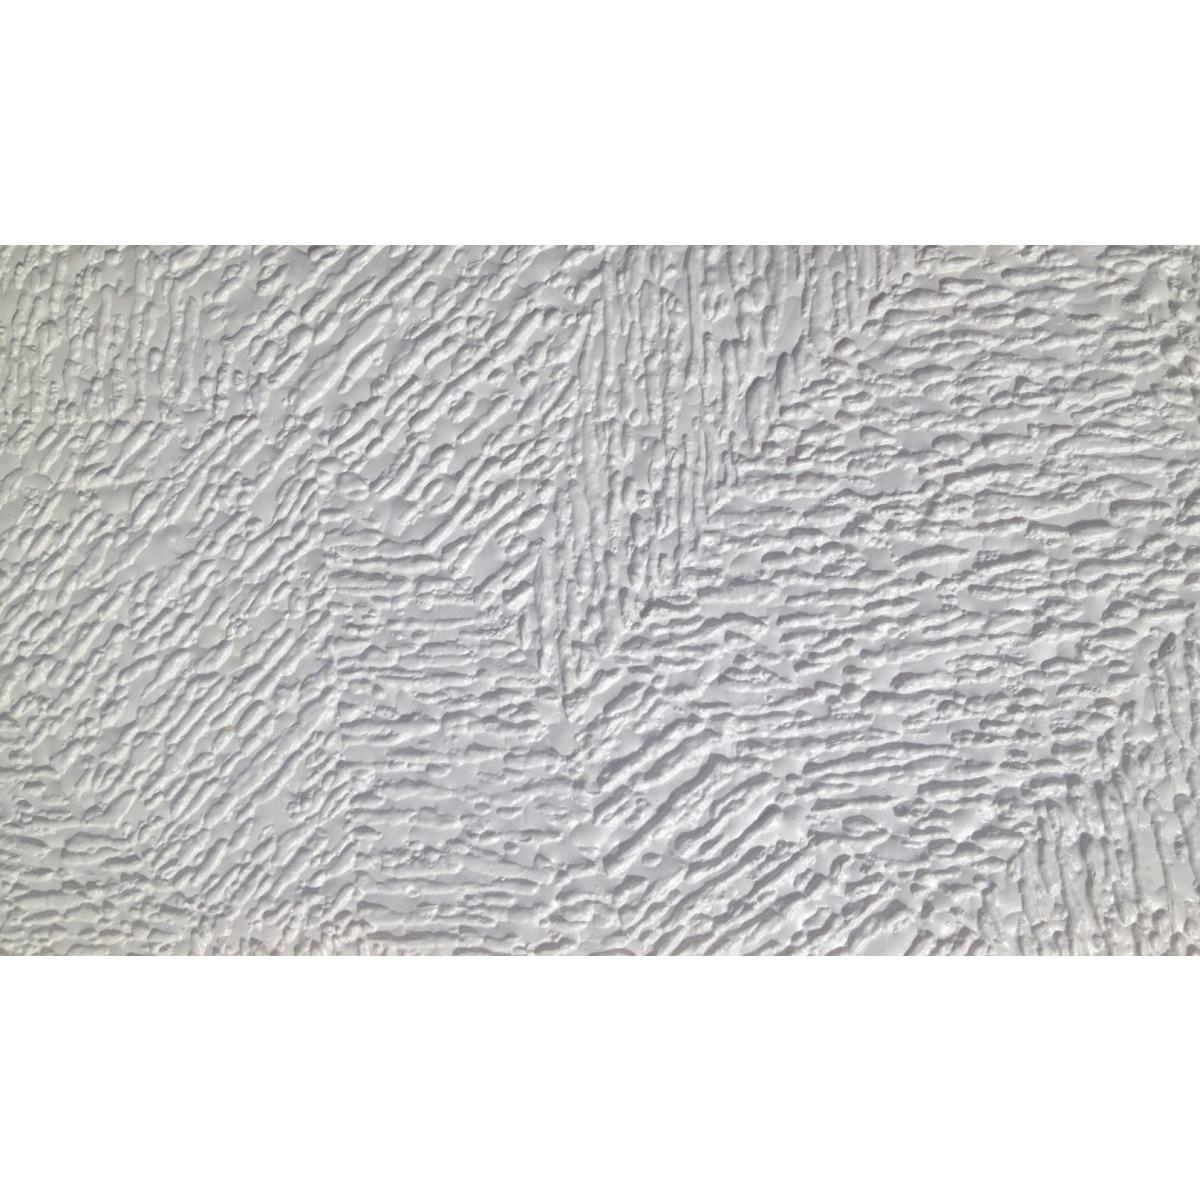 Sculpted Fiberglass Suspended Ceiling Tile